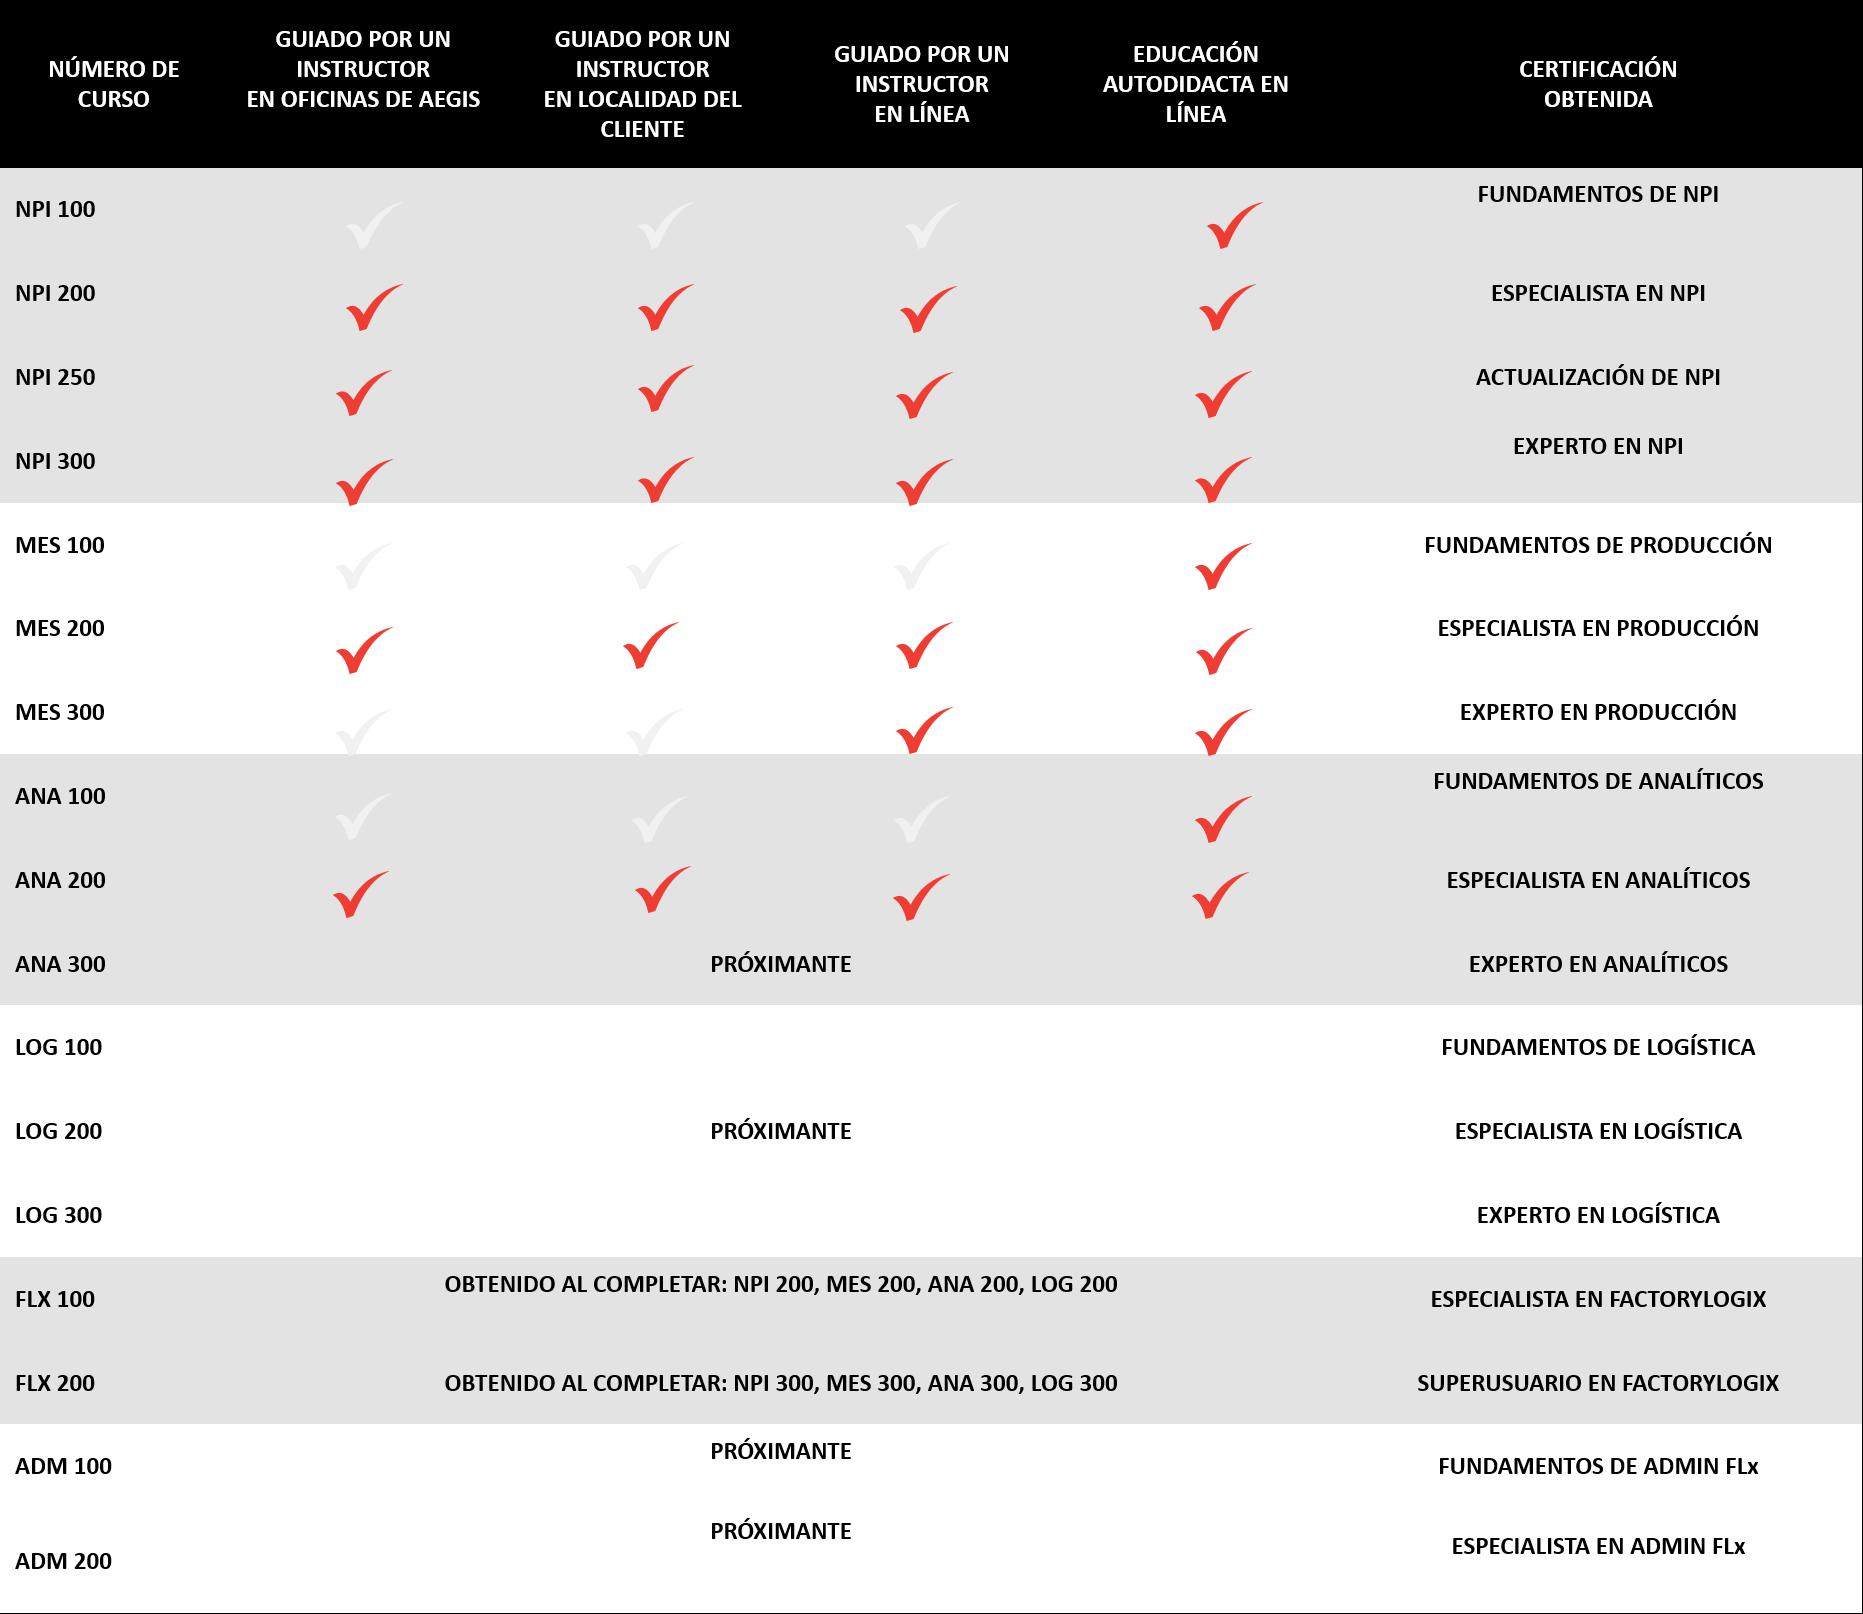 Tabla de FactoryLogix University